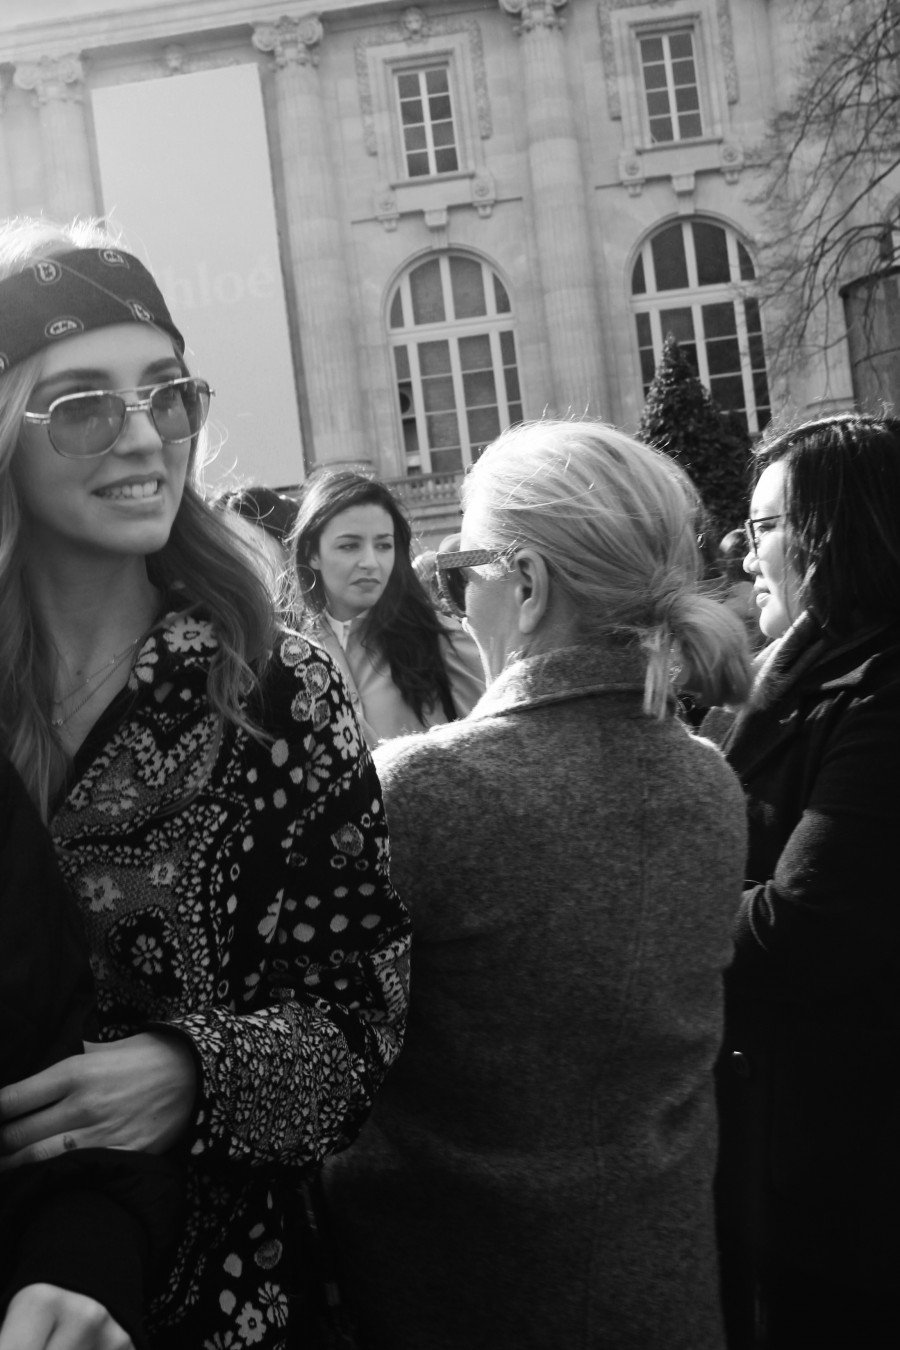 Chiara Ferragni Paris Fashiion Week 2016